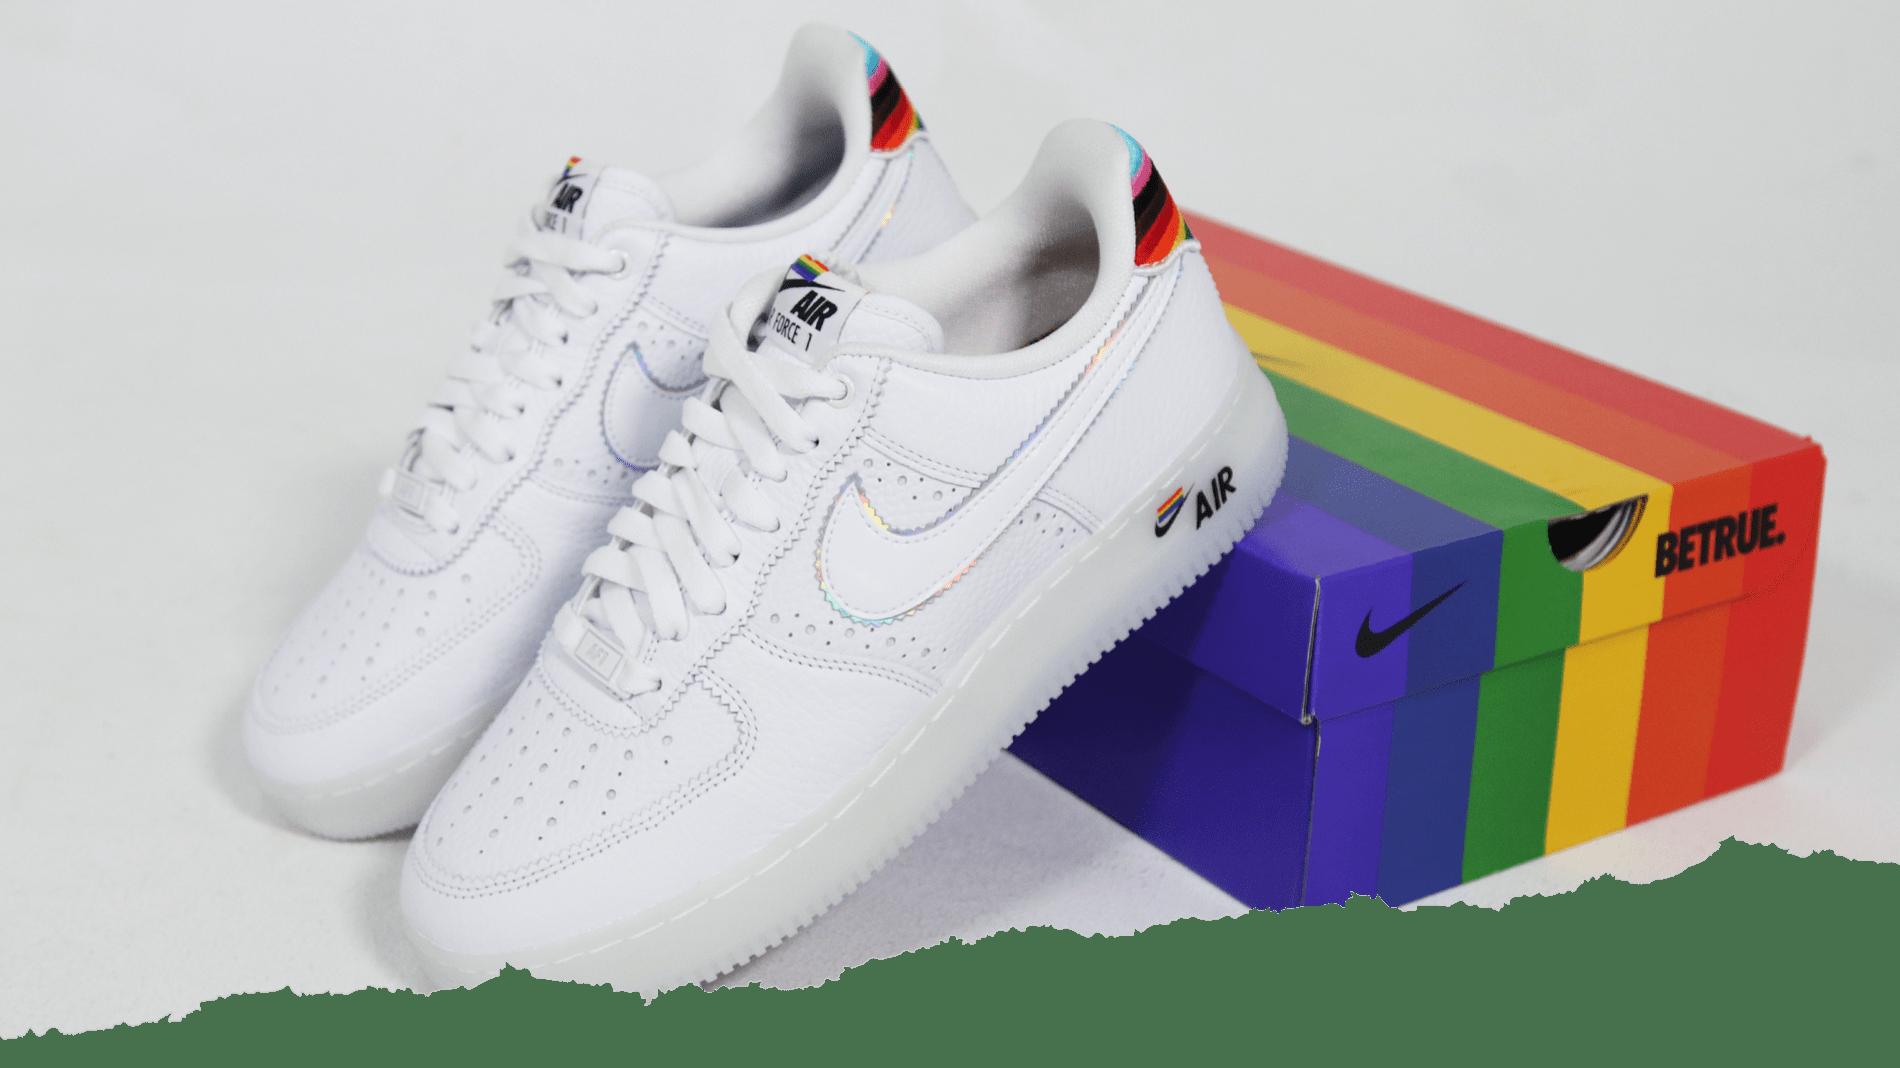 Nike Air Force 1 - 'BETRUE'